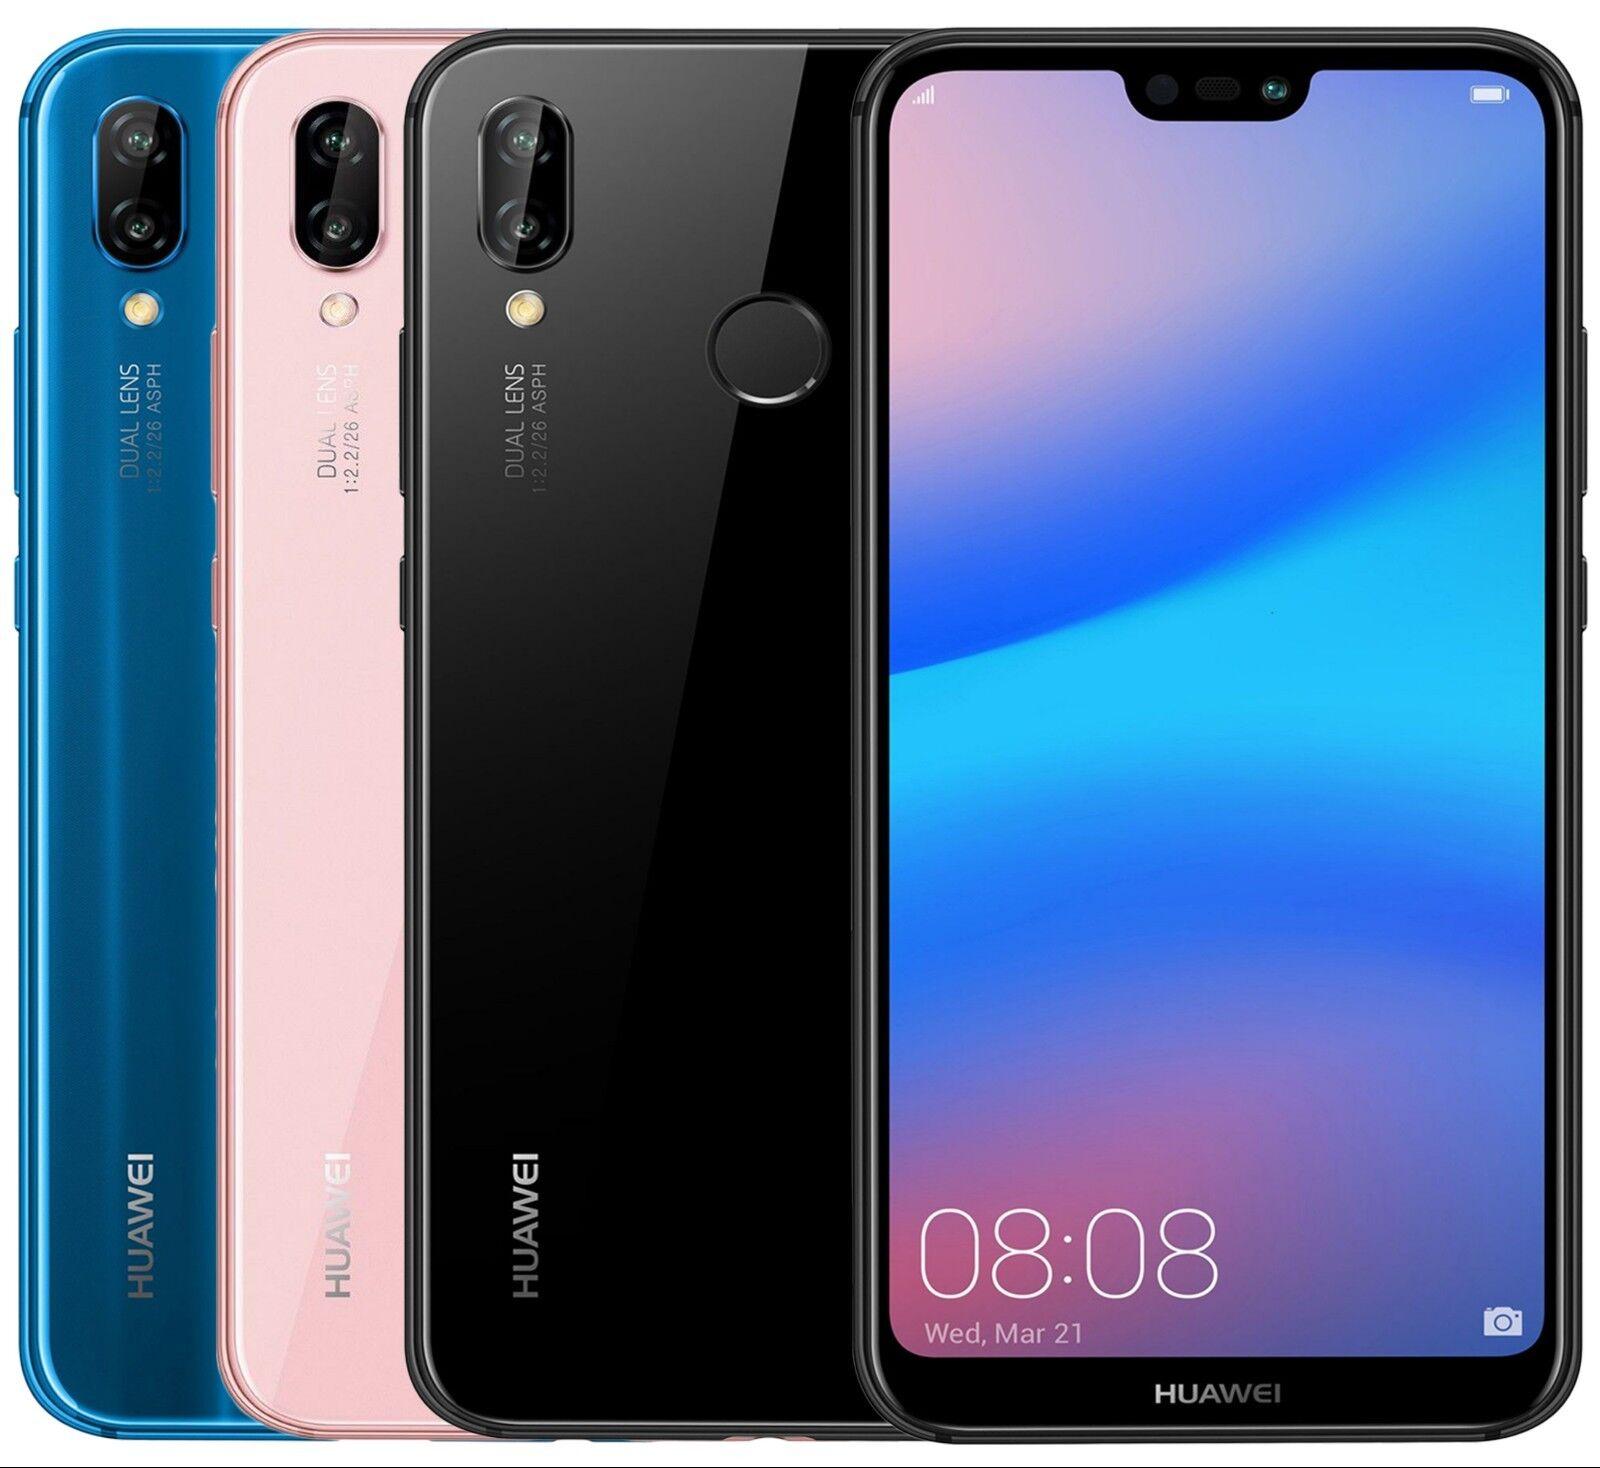 "Android Phone - Huawei P20 Lite ANE-LX3 Dual Sim (FACTORY UNLOCKED) 5.8"" 4GB RAM Black Blue Pink"